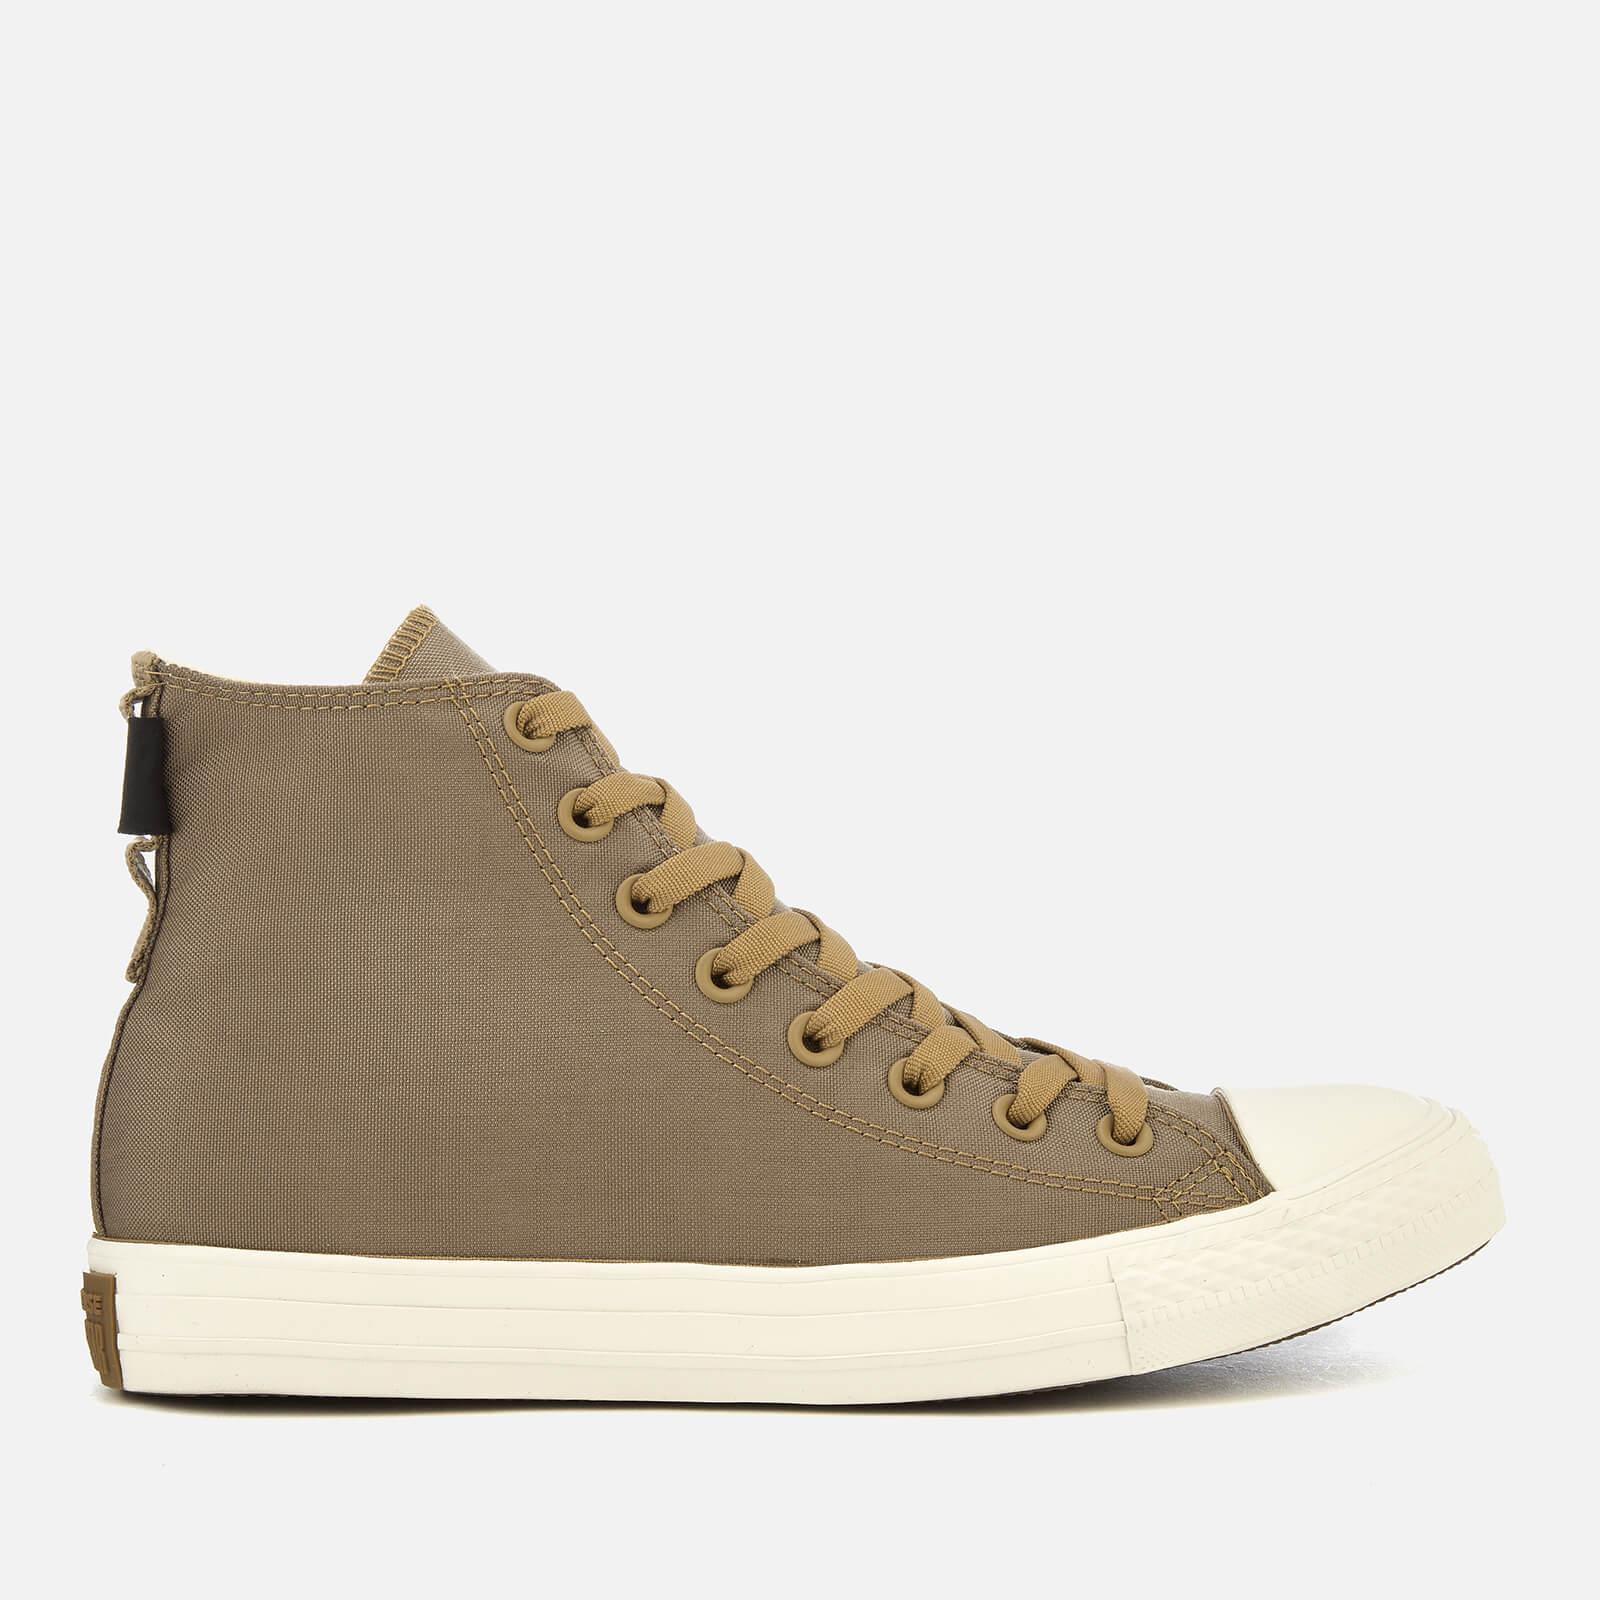 best loved 83a23 451c7 Converse Men s Chuck Taylor All Star Cordura Hi-Top Trainers - Teak Egret Brown  Mens Footwear   TheHut.com